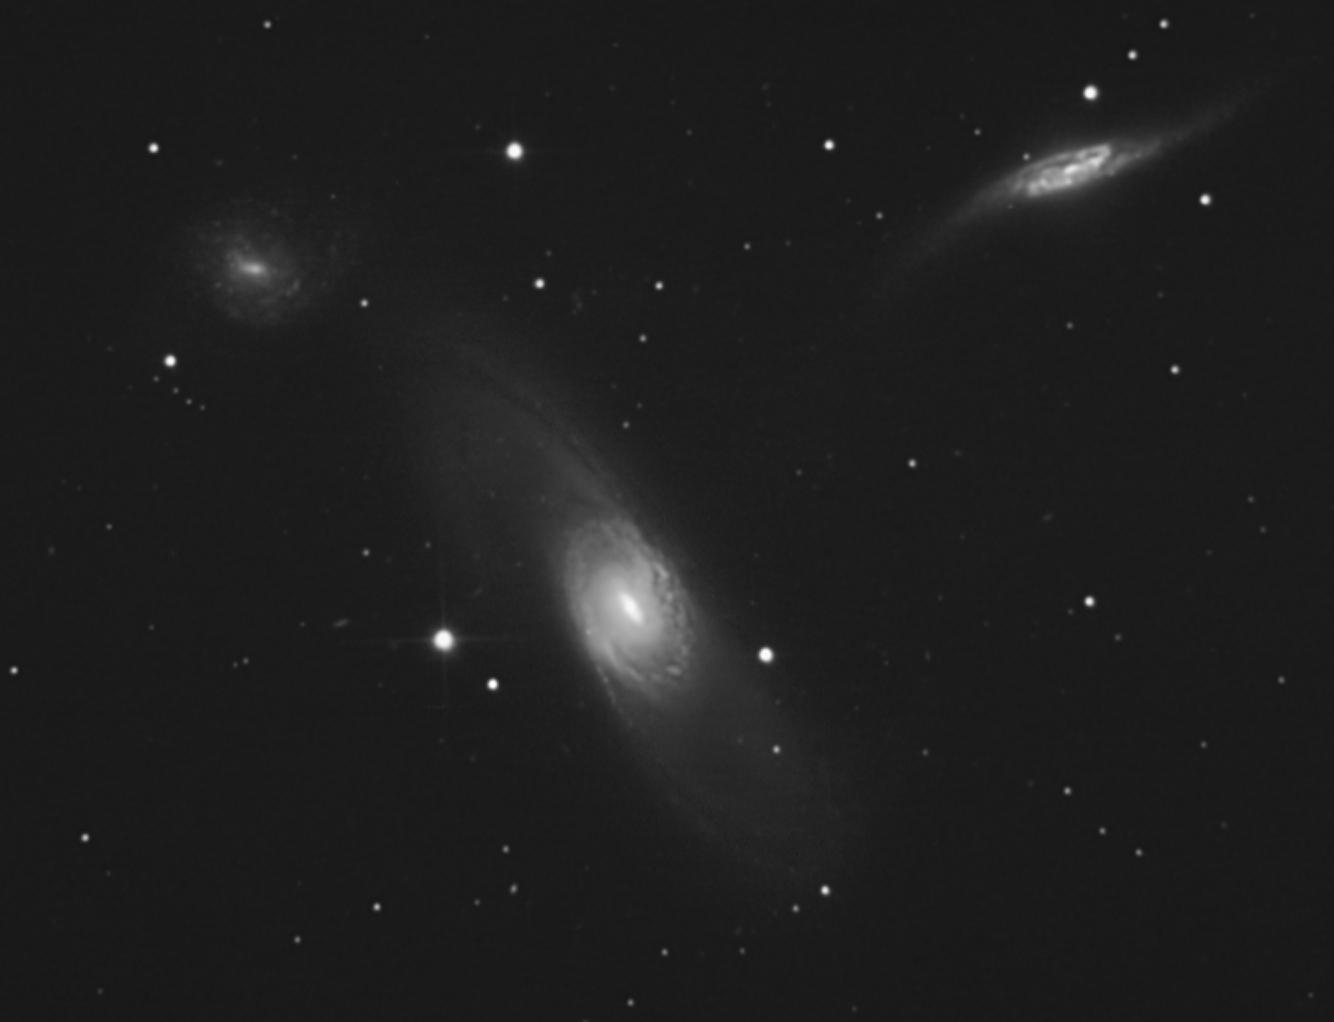 Deep Sky Planetary Technique (by Shaihulud) PvUOqEgxrKeH_16536x16536_wmhqkGbg